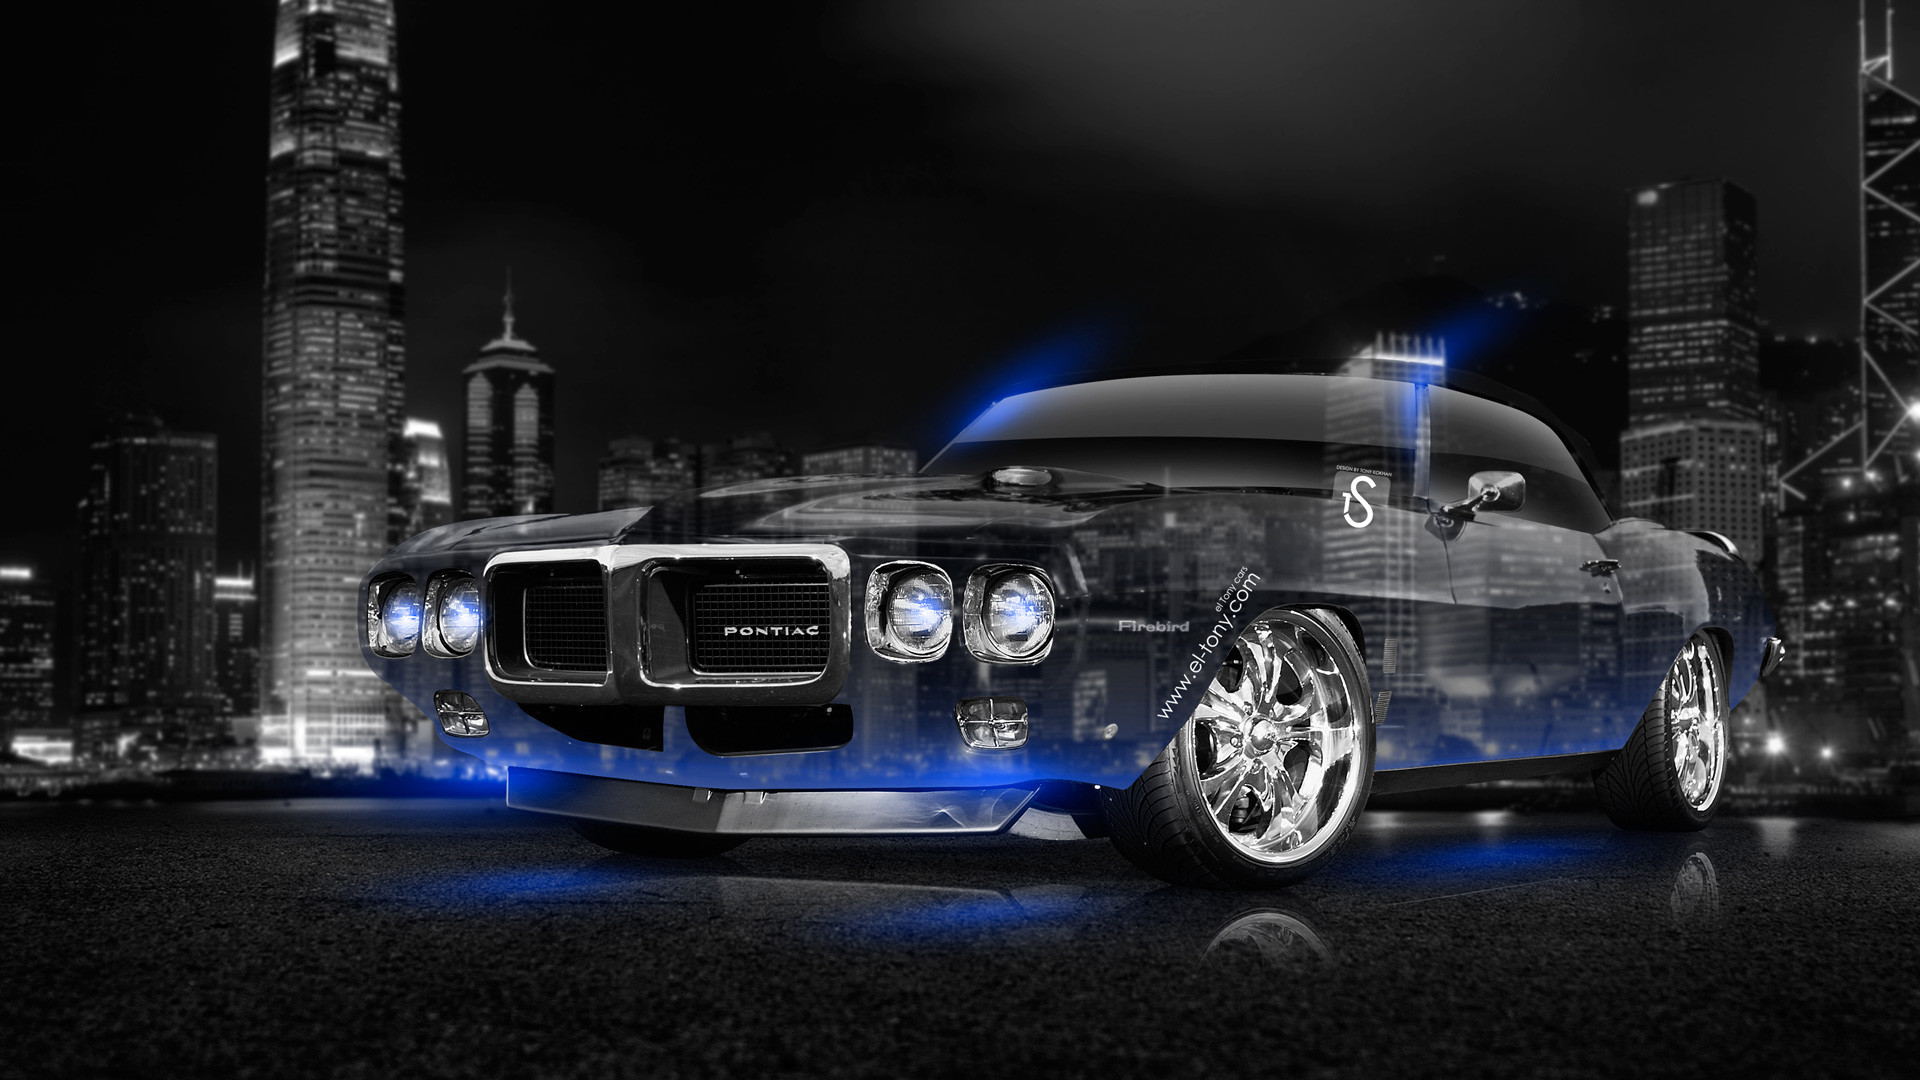 Pontiac-Firebird-Muscle-Retro-Crystal-City-Car-2014- …